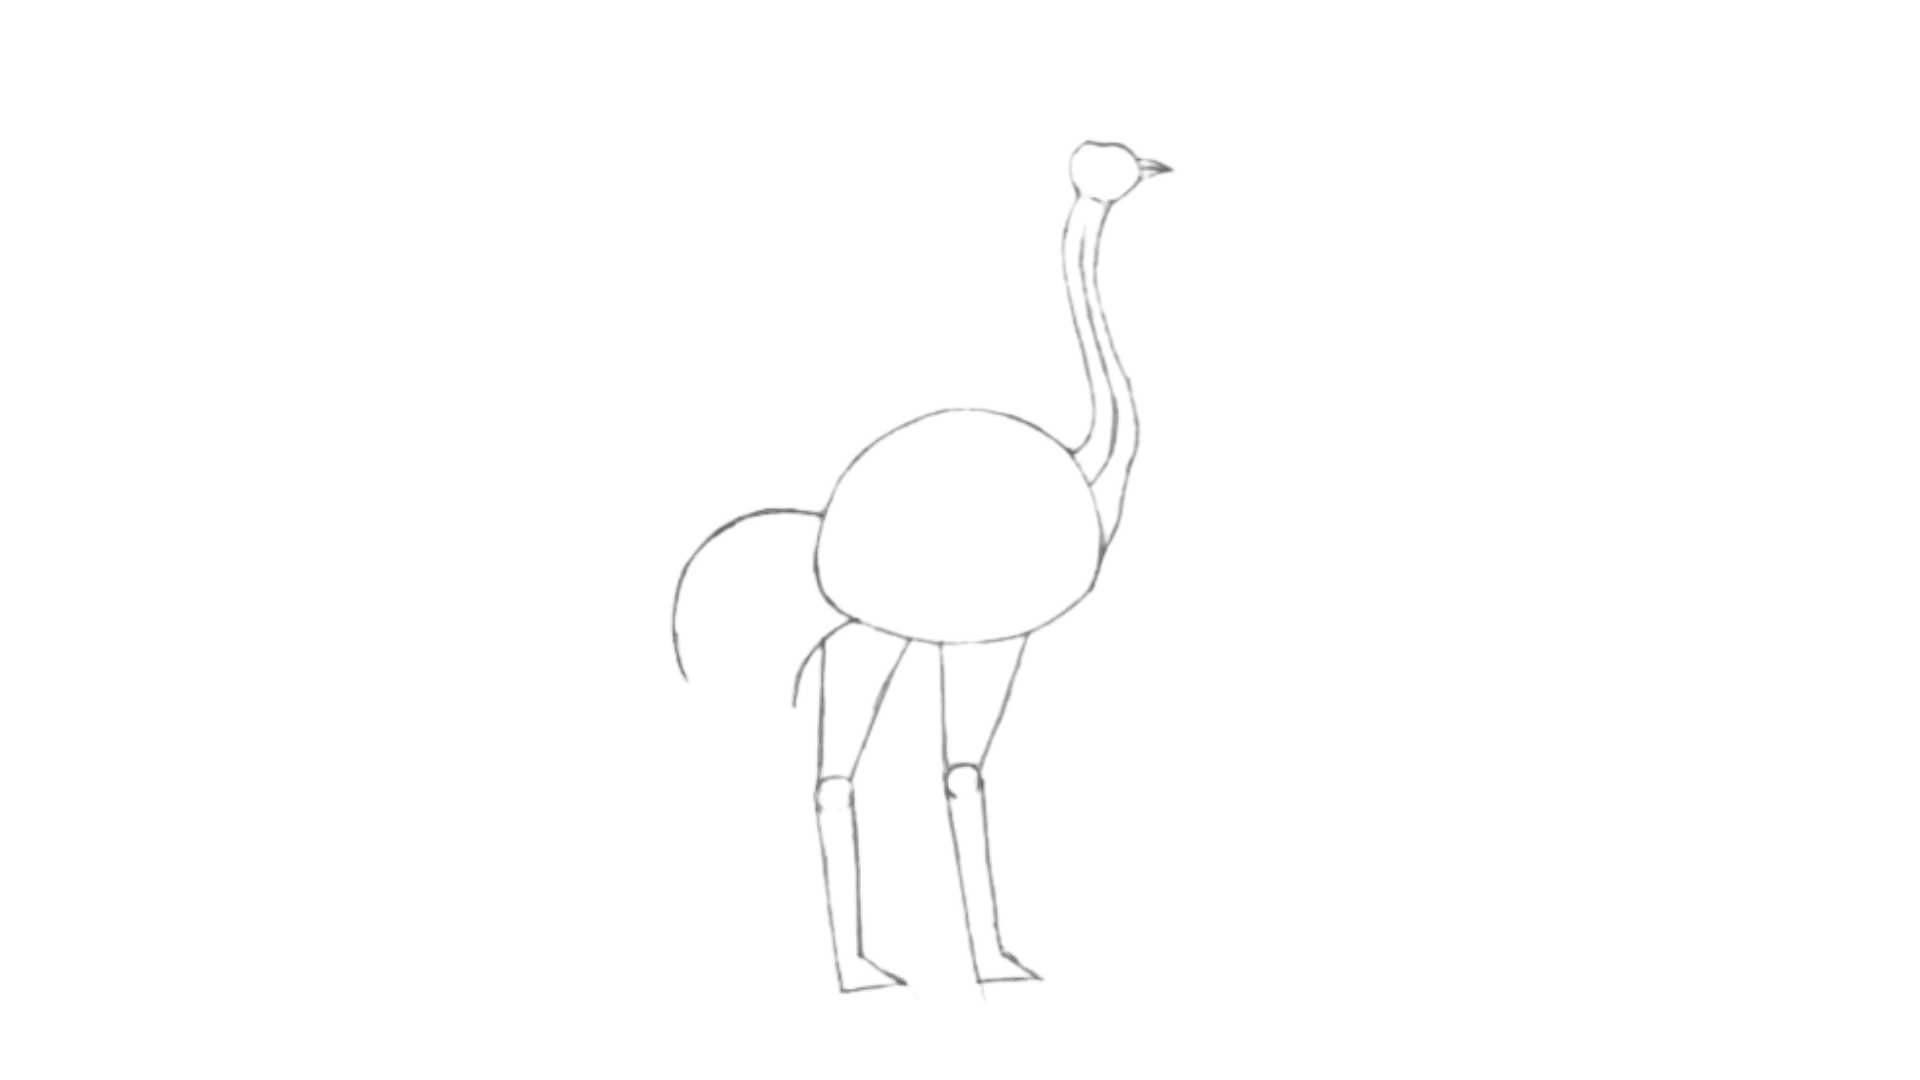 step Ostrich draw 5